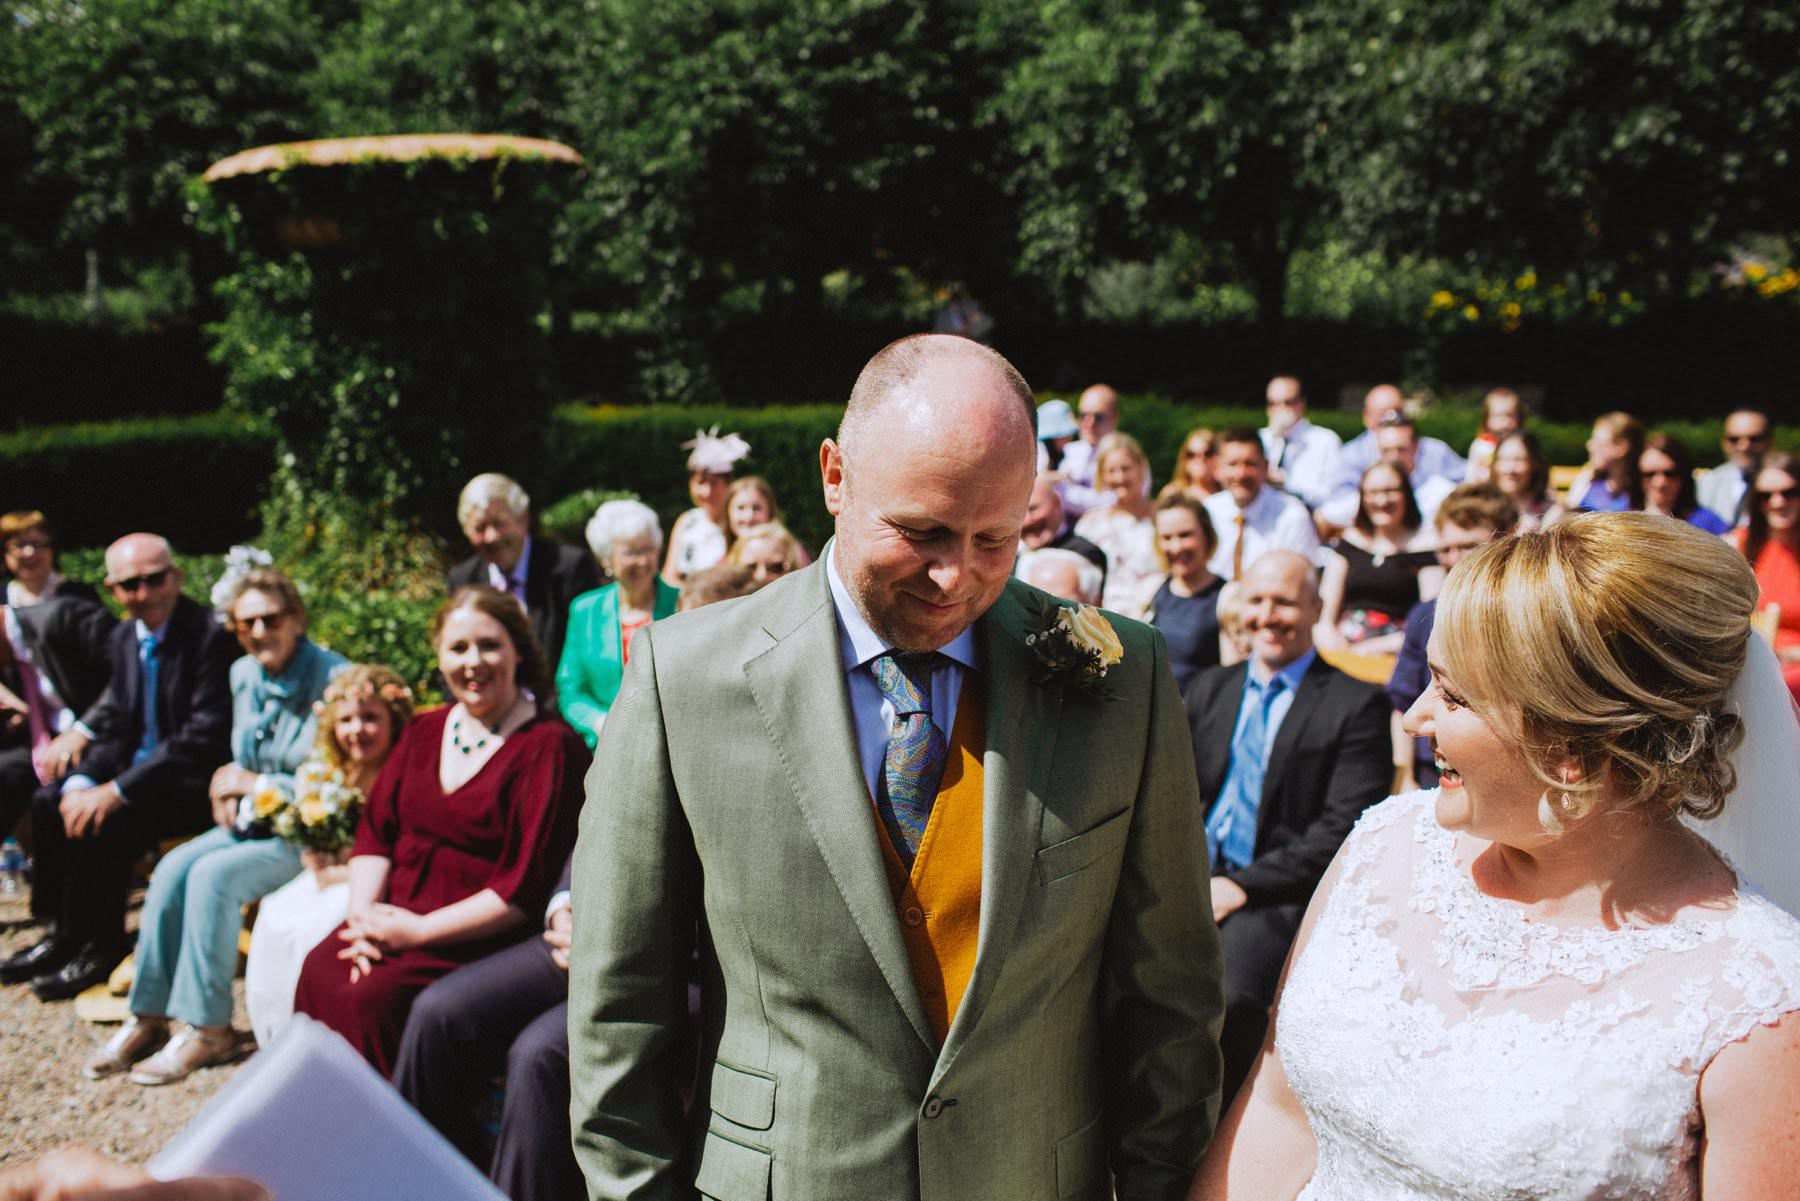 bald groom in green sports jacket gets emotional seeing his bride